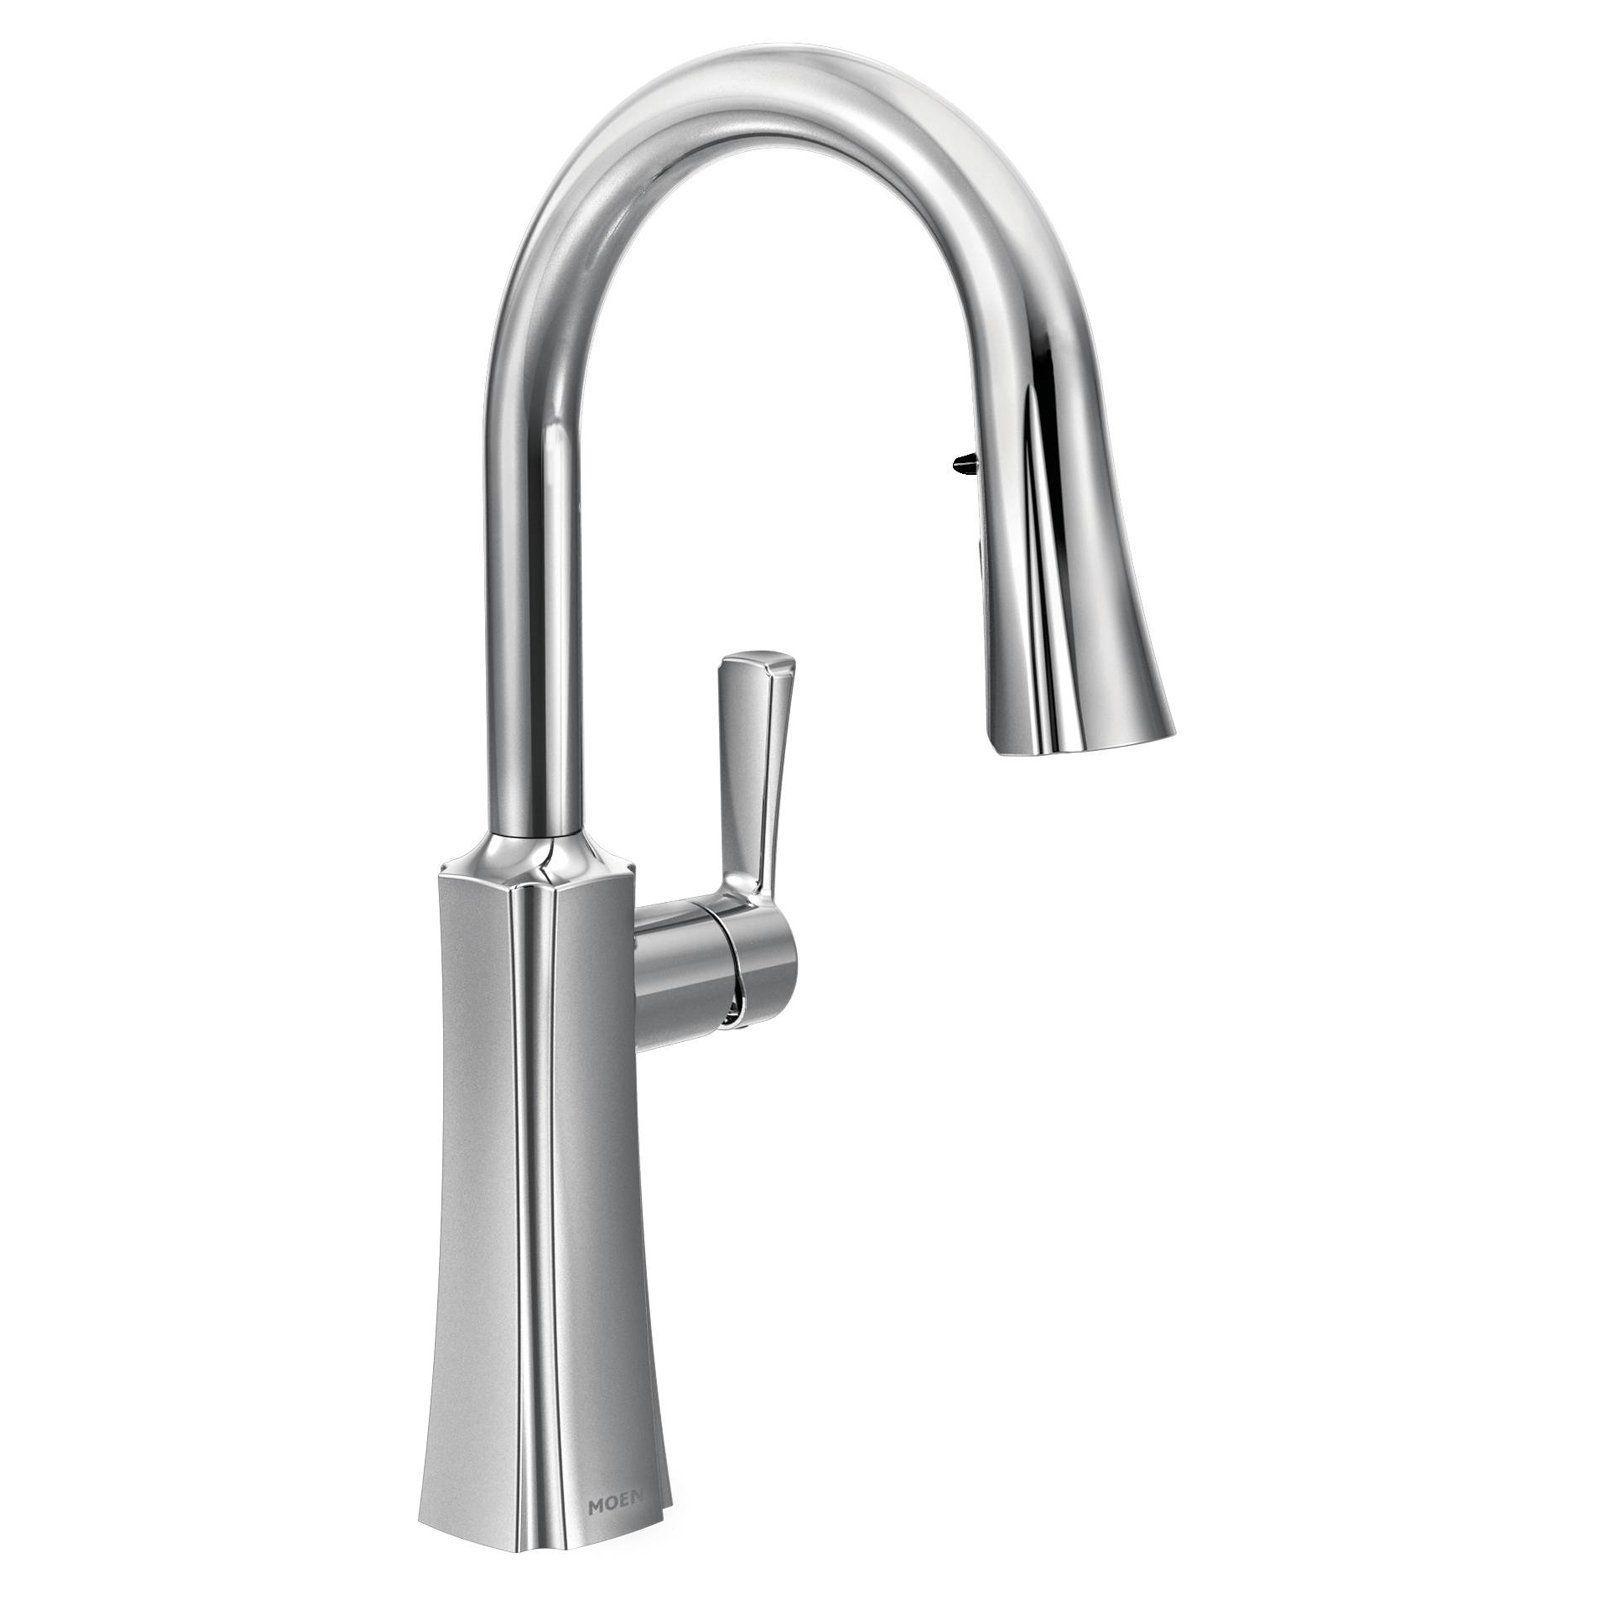 Moen Etch Chrome One Handle High Arc Pulldown Kitchen Faucet